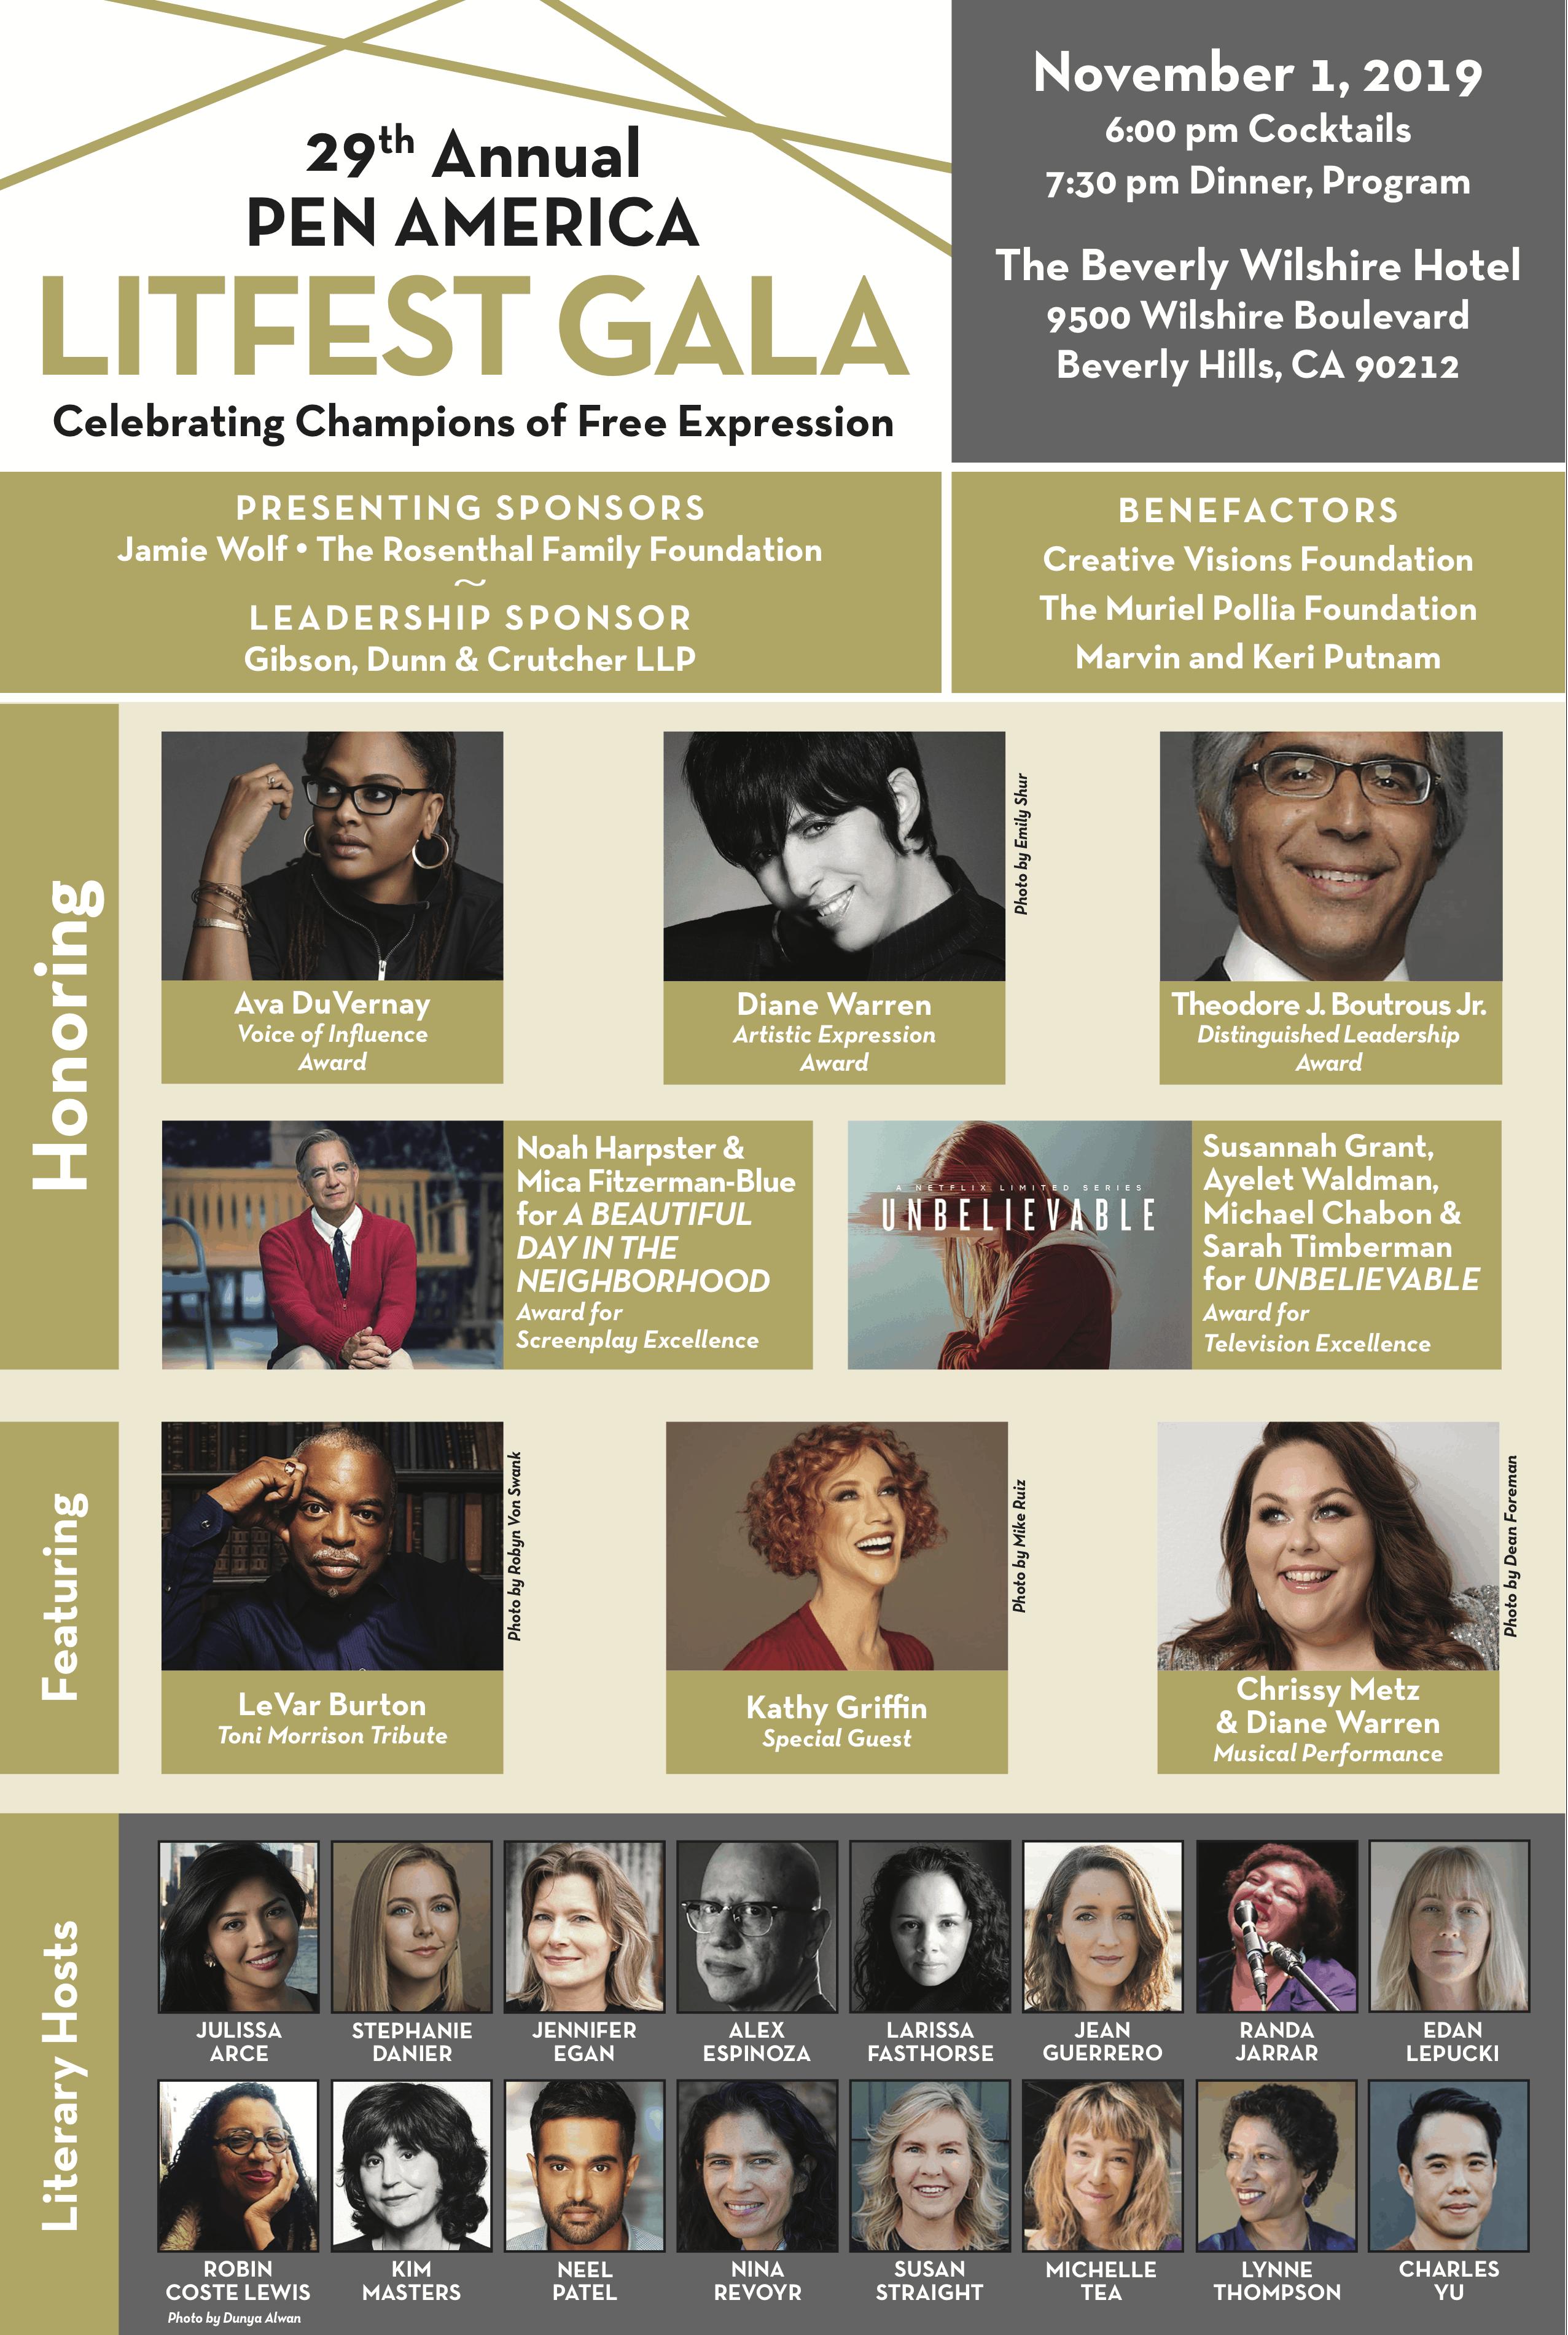 29th Annual PEN America LitFest Gala Invite, Revised